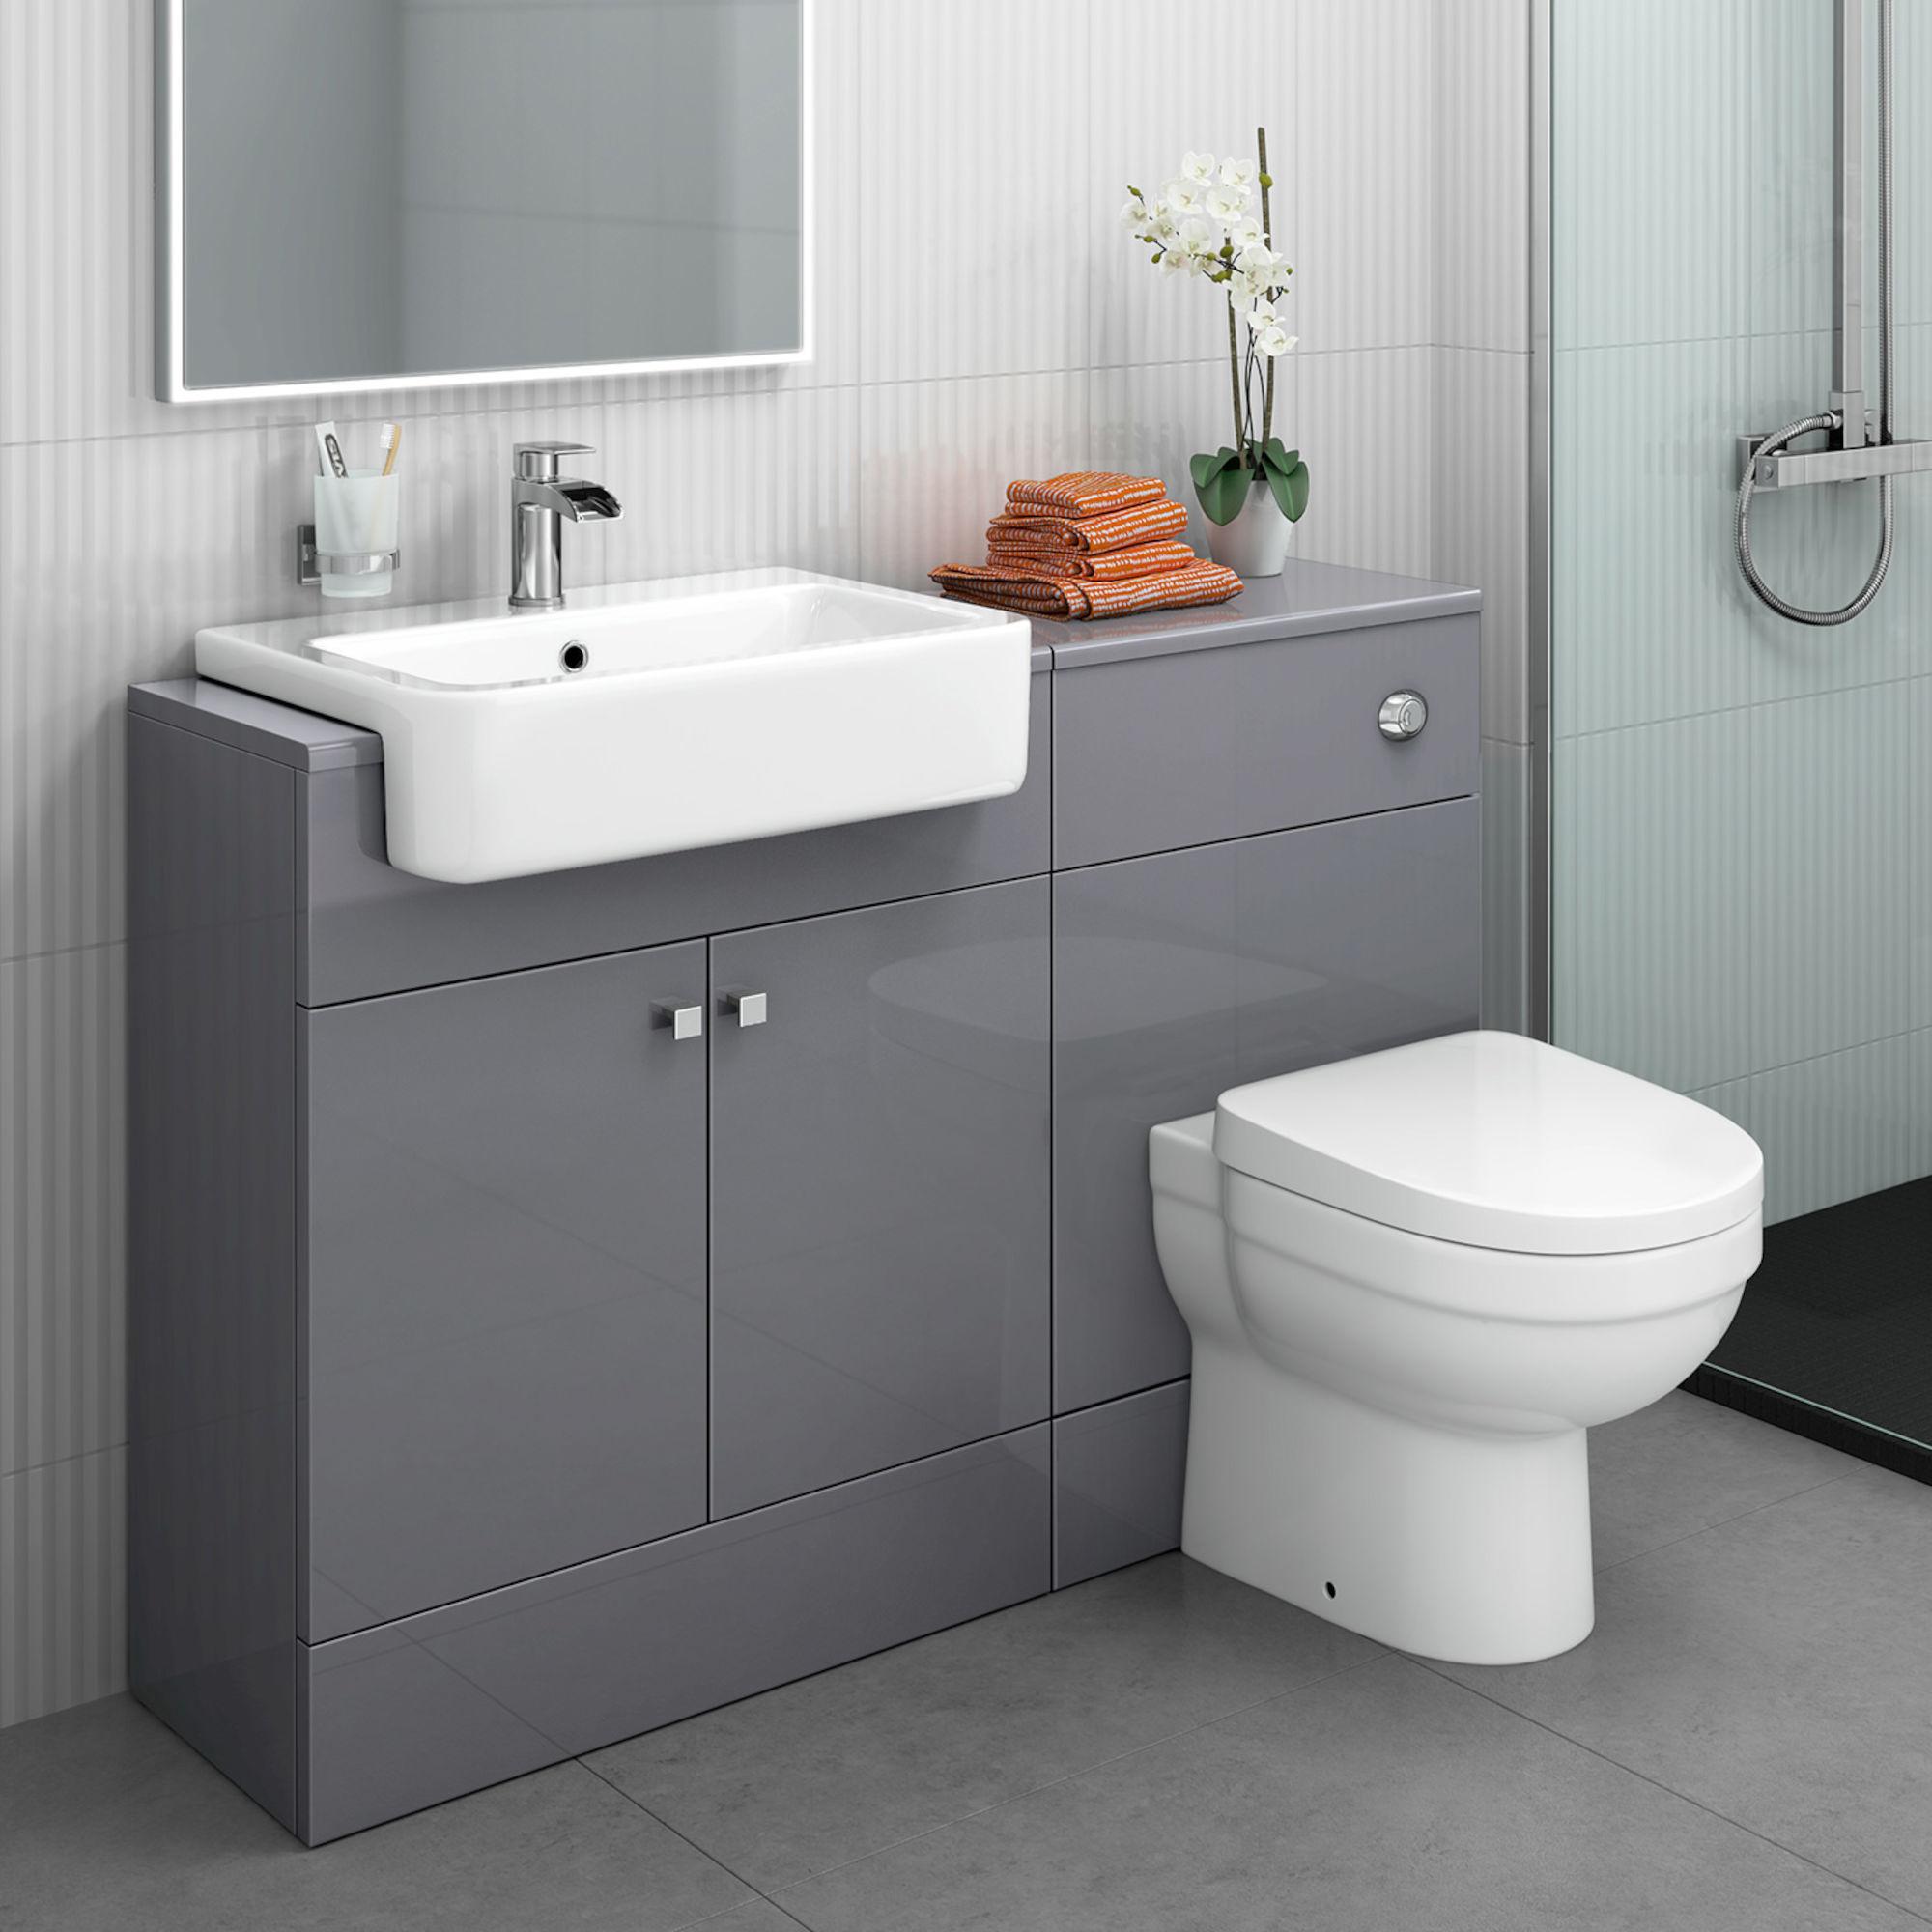 1160mm Harper Gloss Grey Combined Vanity Unit - Sabrosa II Pan